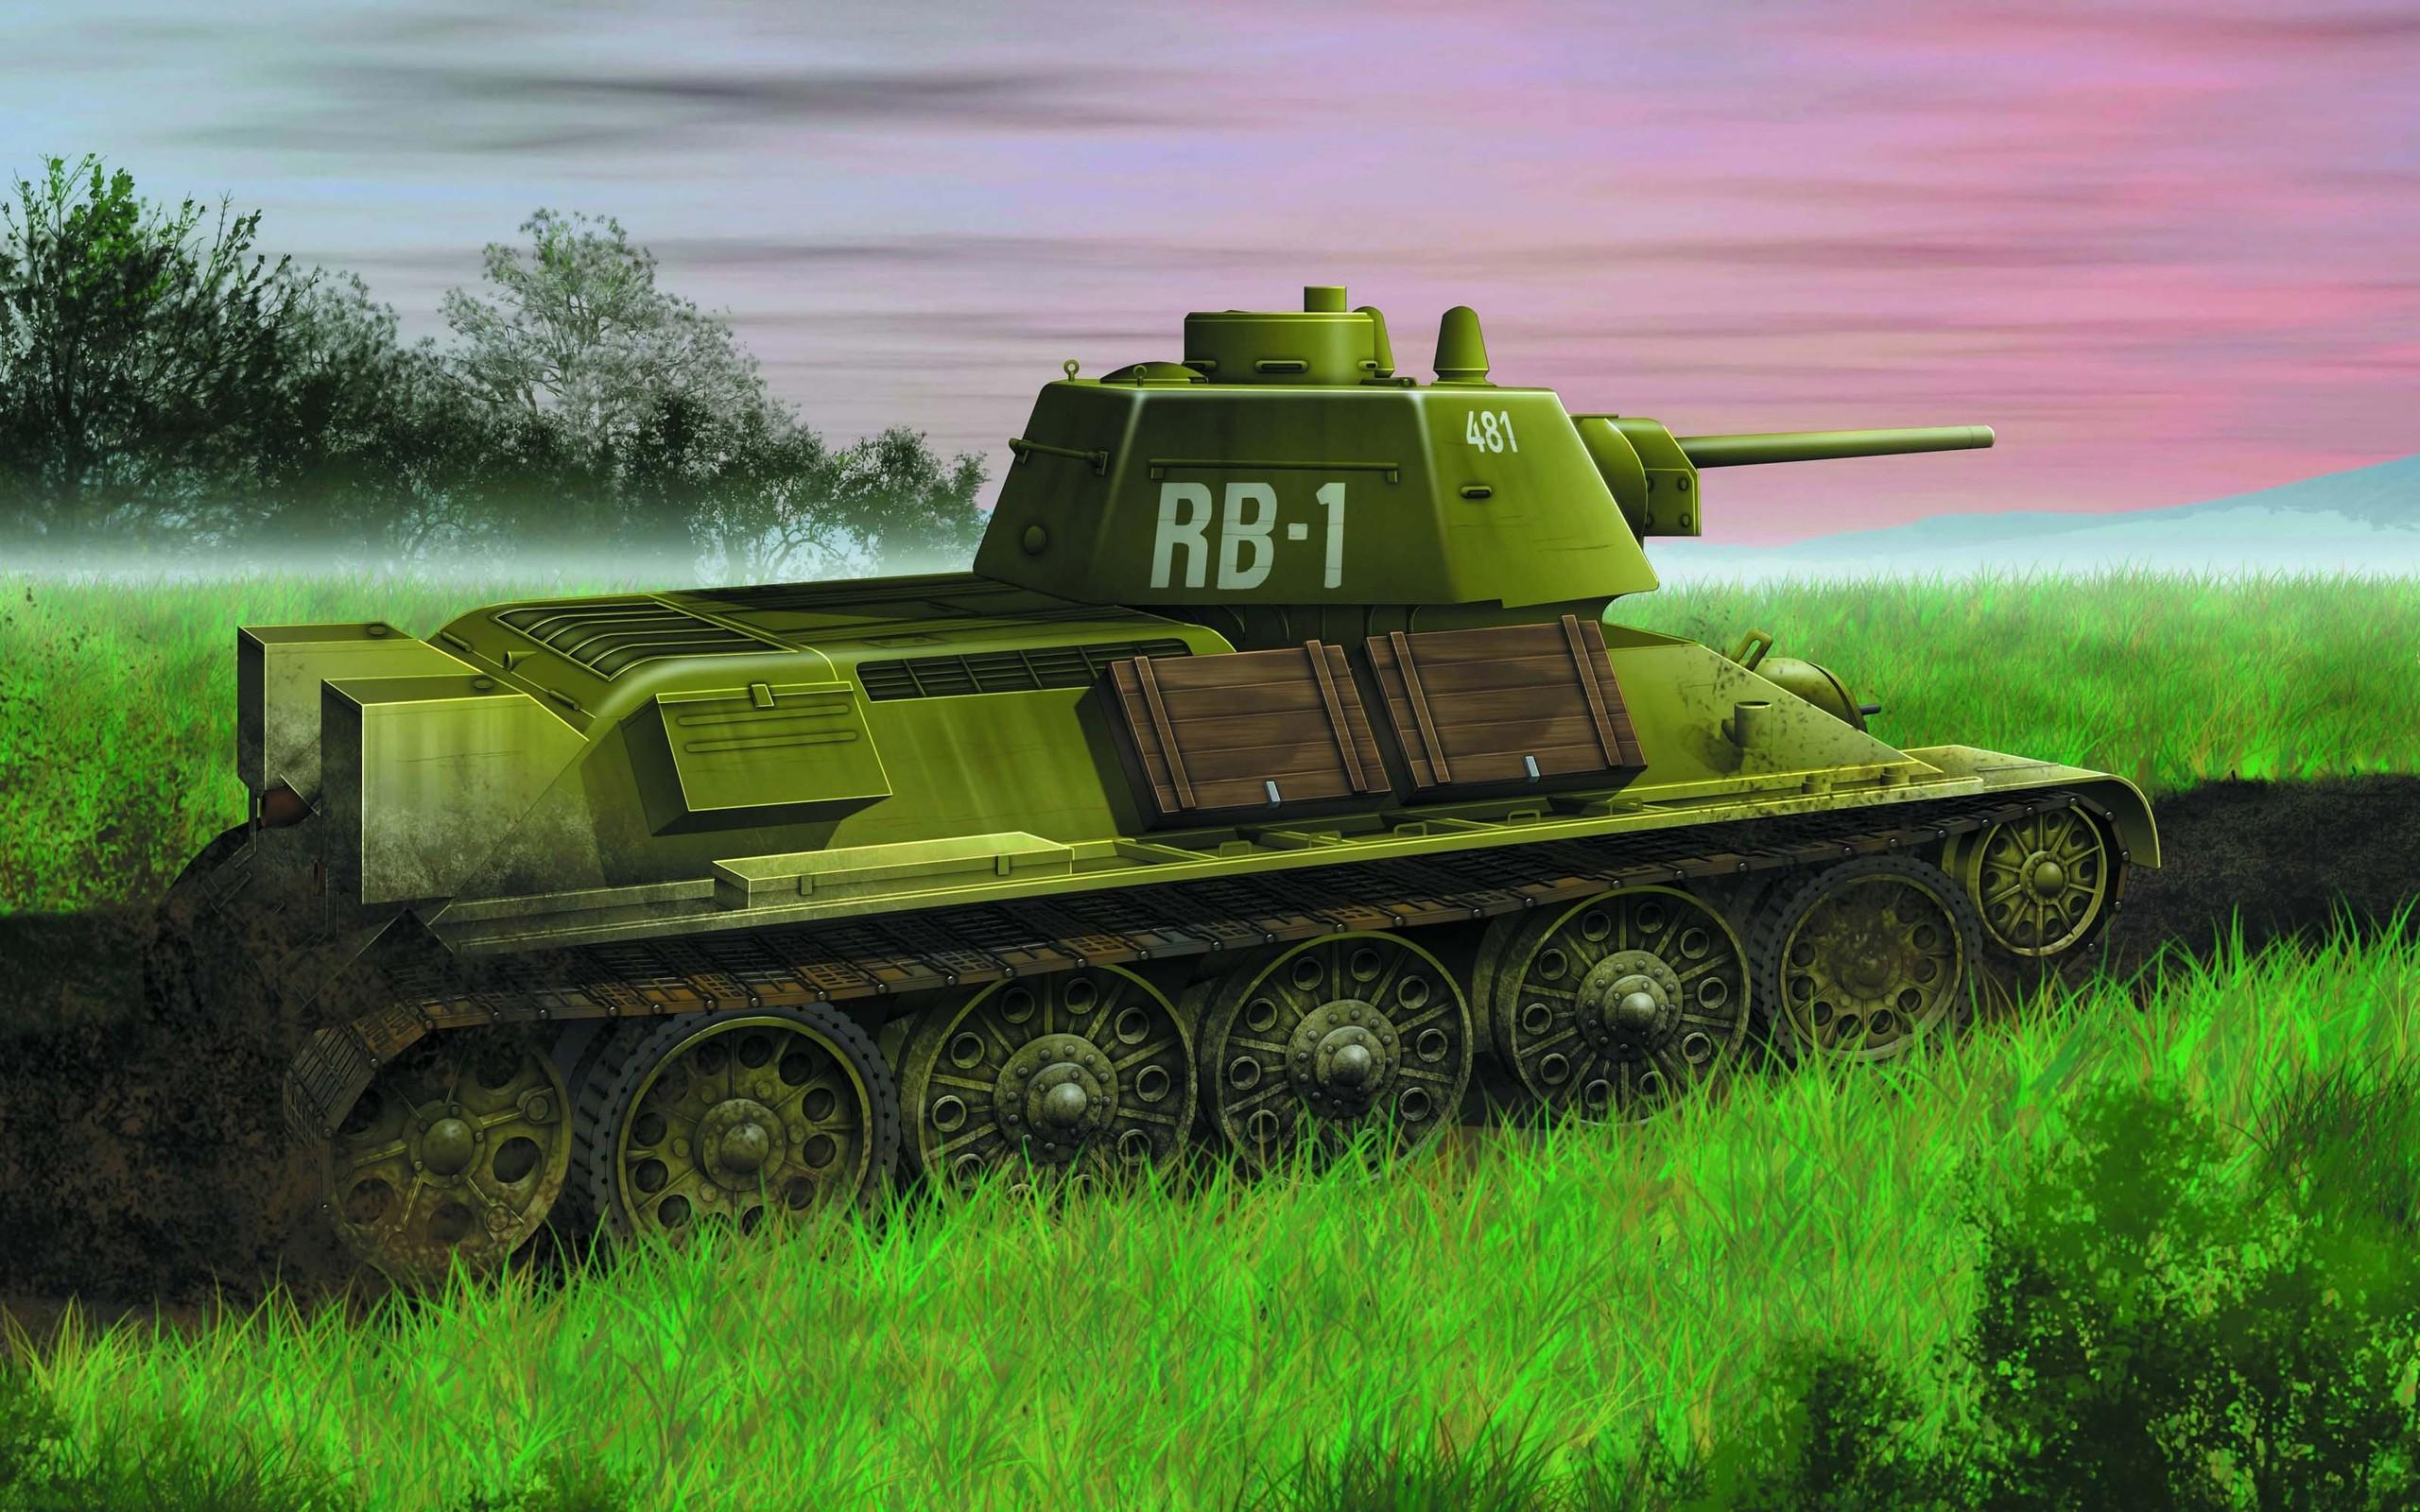 Картинка советских танков